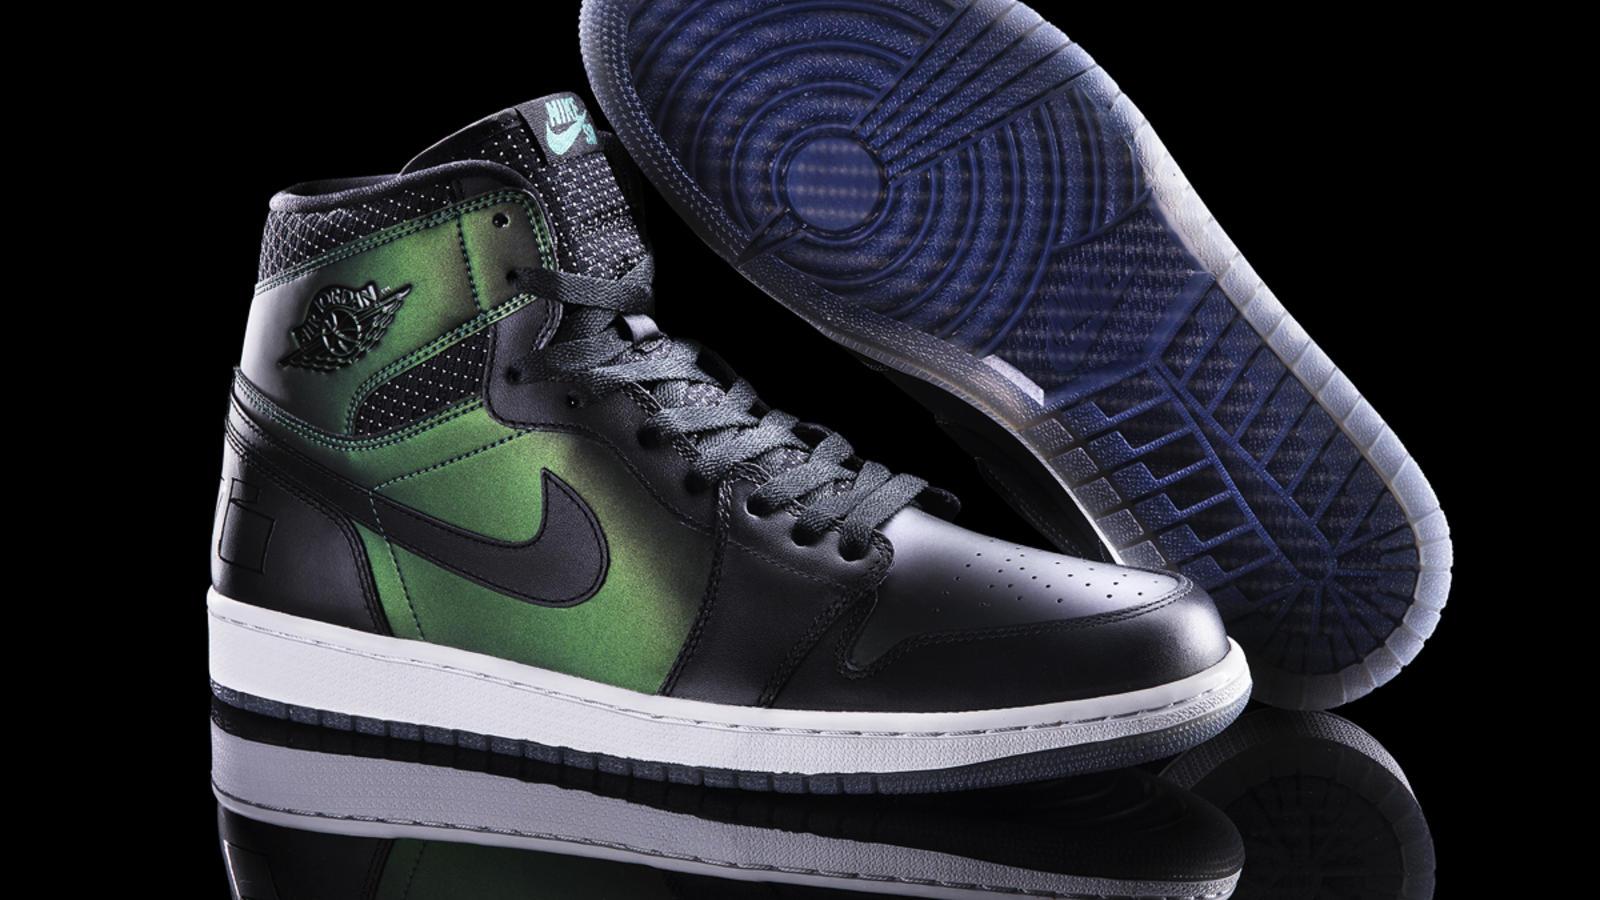 green nike jordan shoes